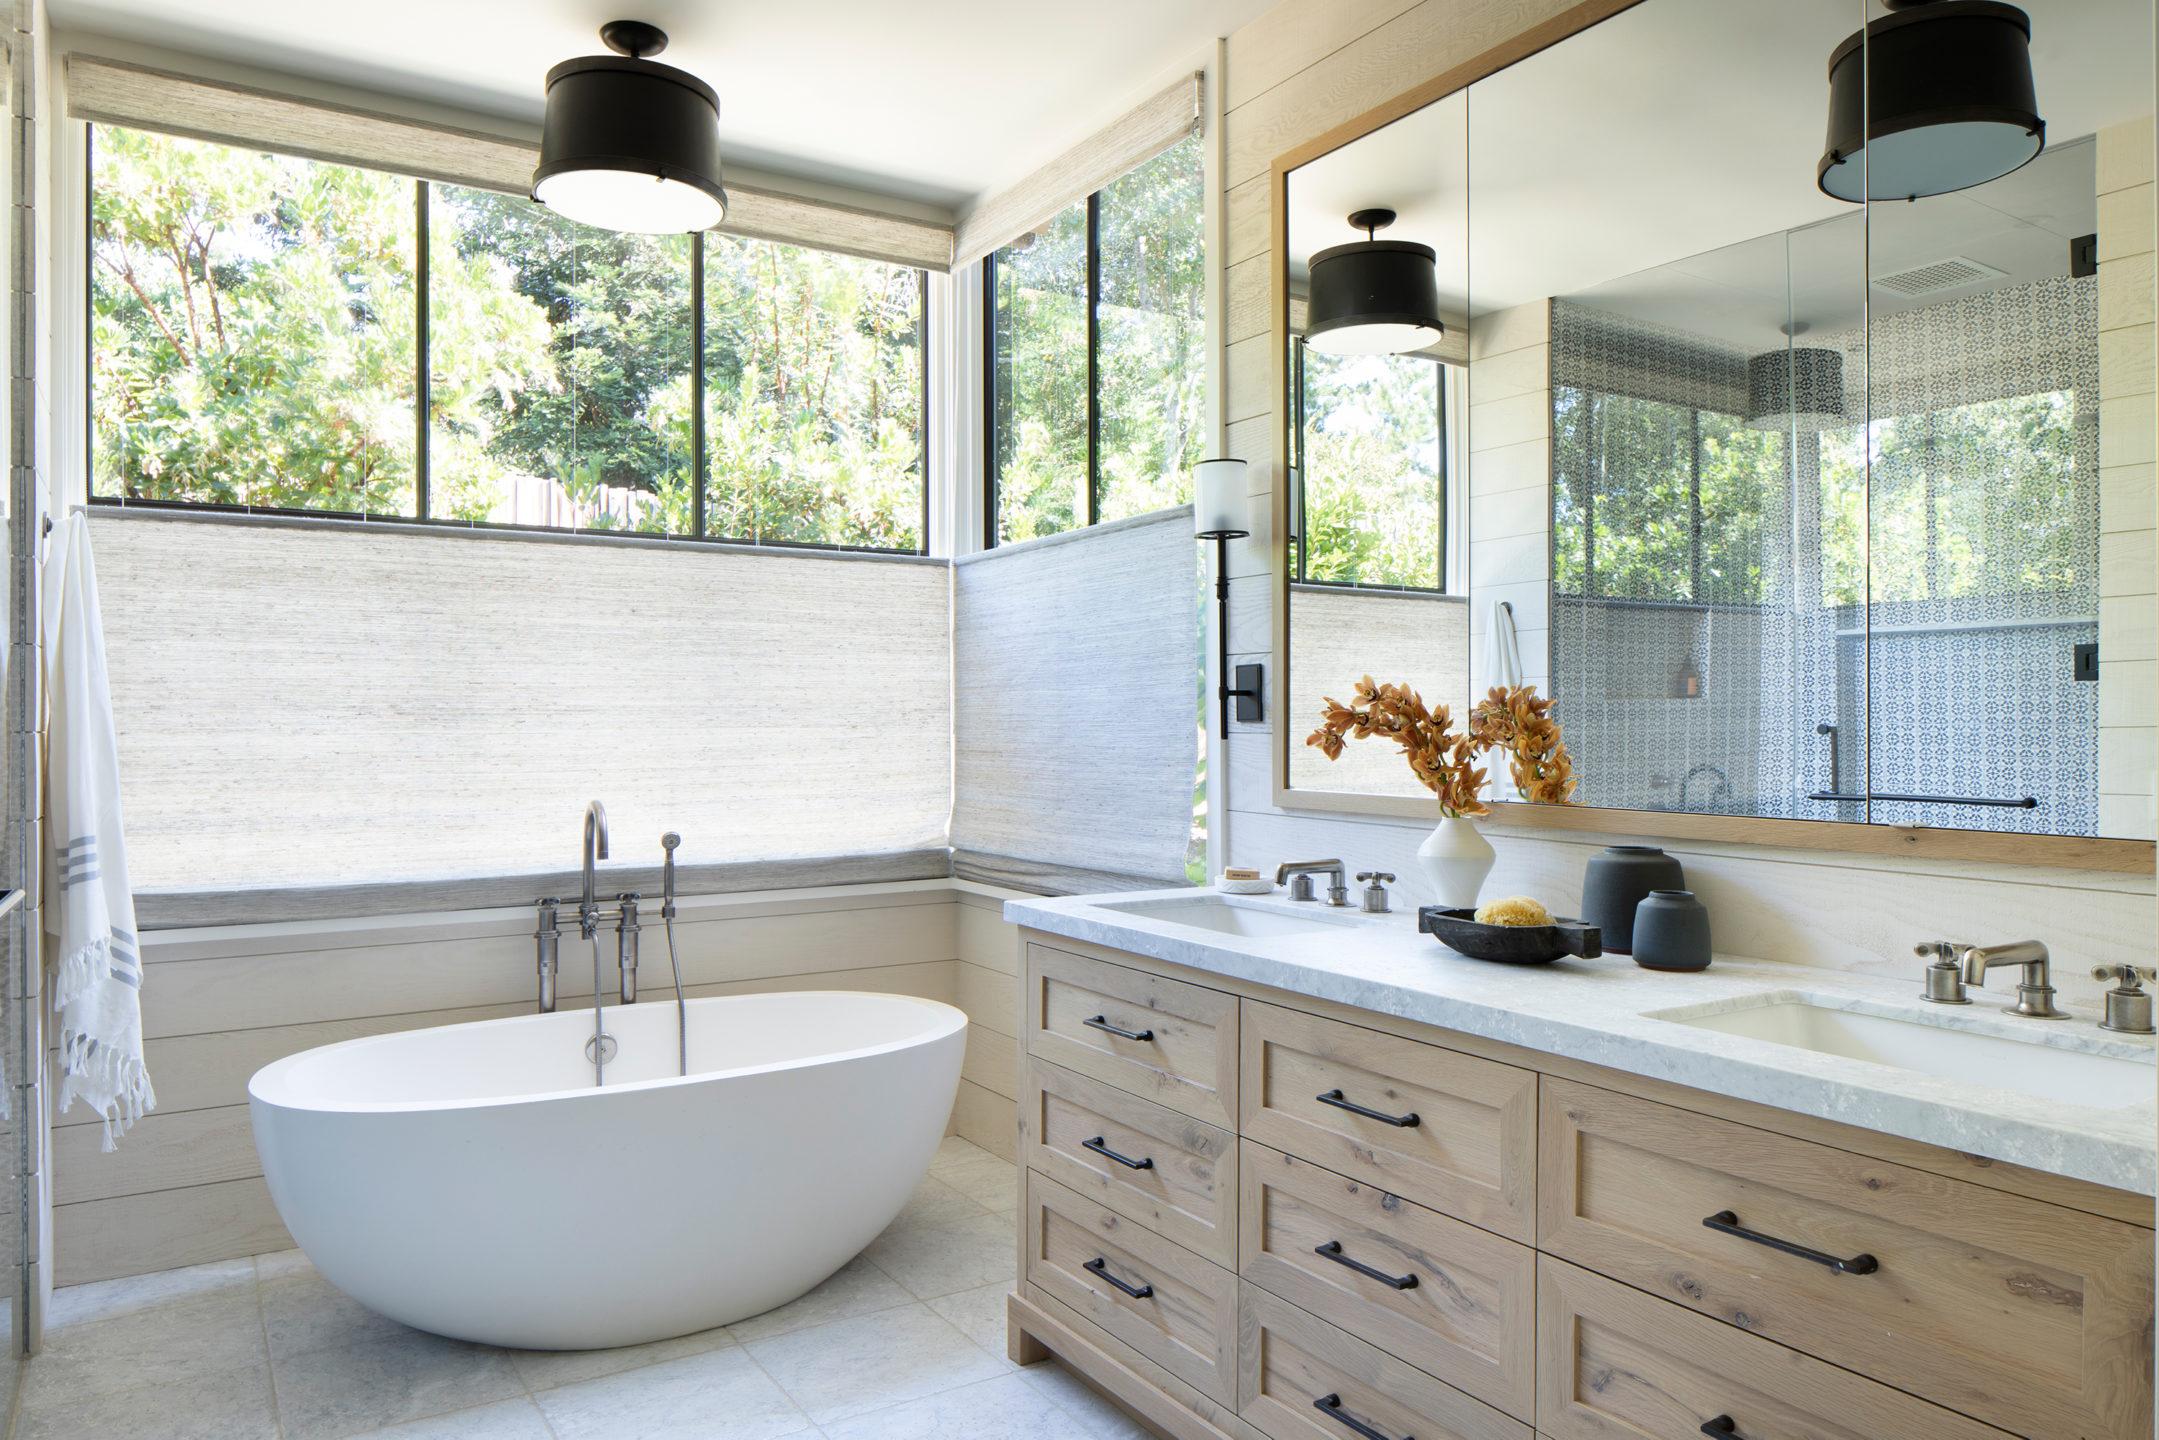 Jennifer_robins_interiors_projects_pacific_heights_portola_valley_bathroom_bath_tub_counter_Portola_26_HR